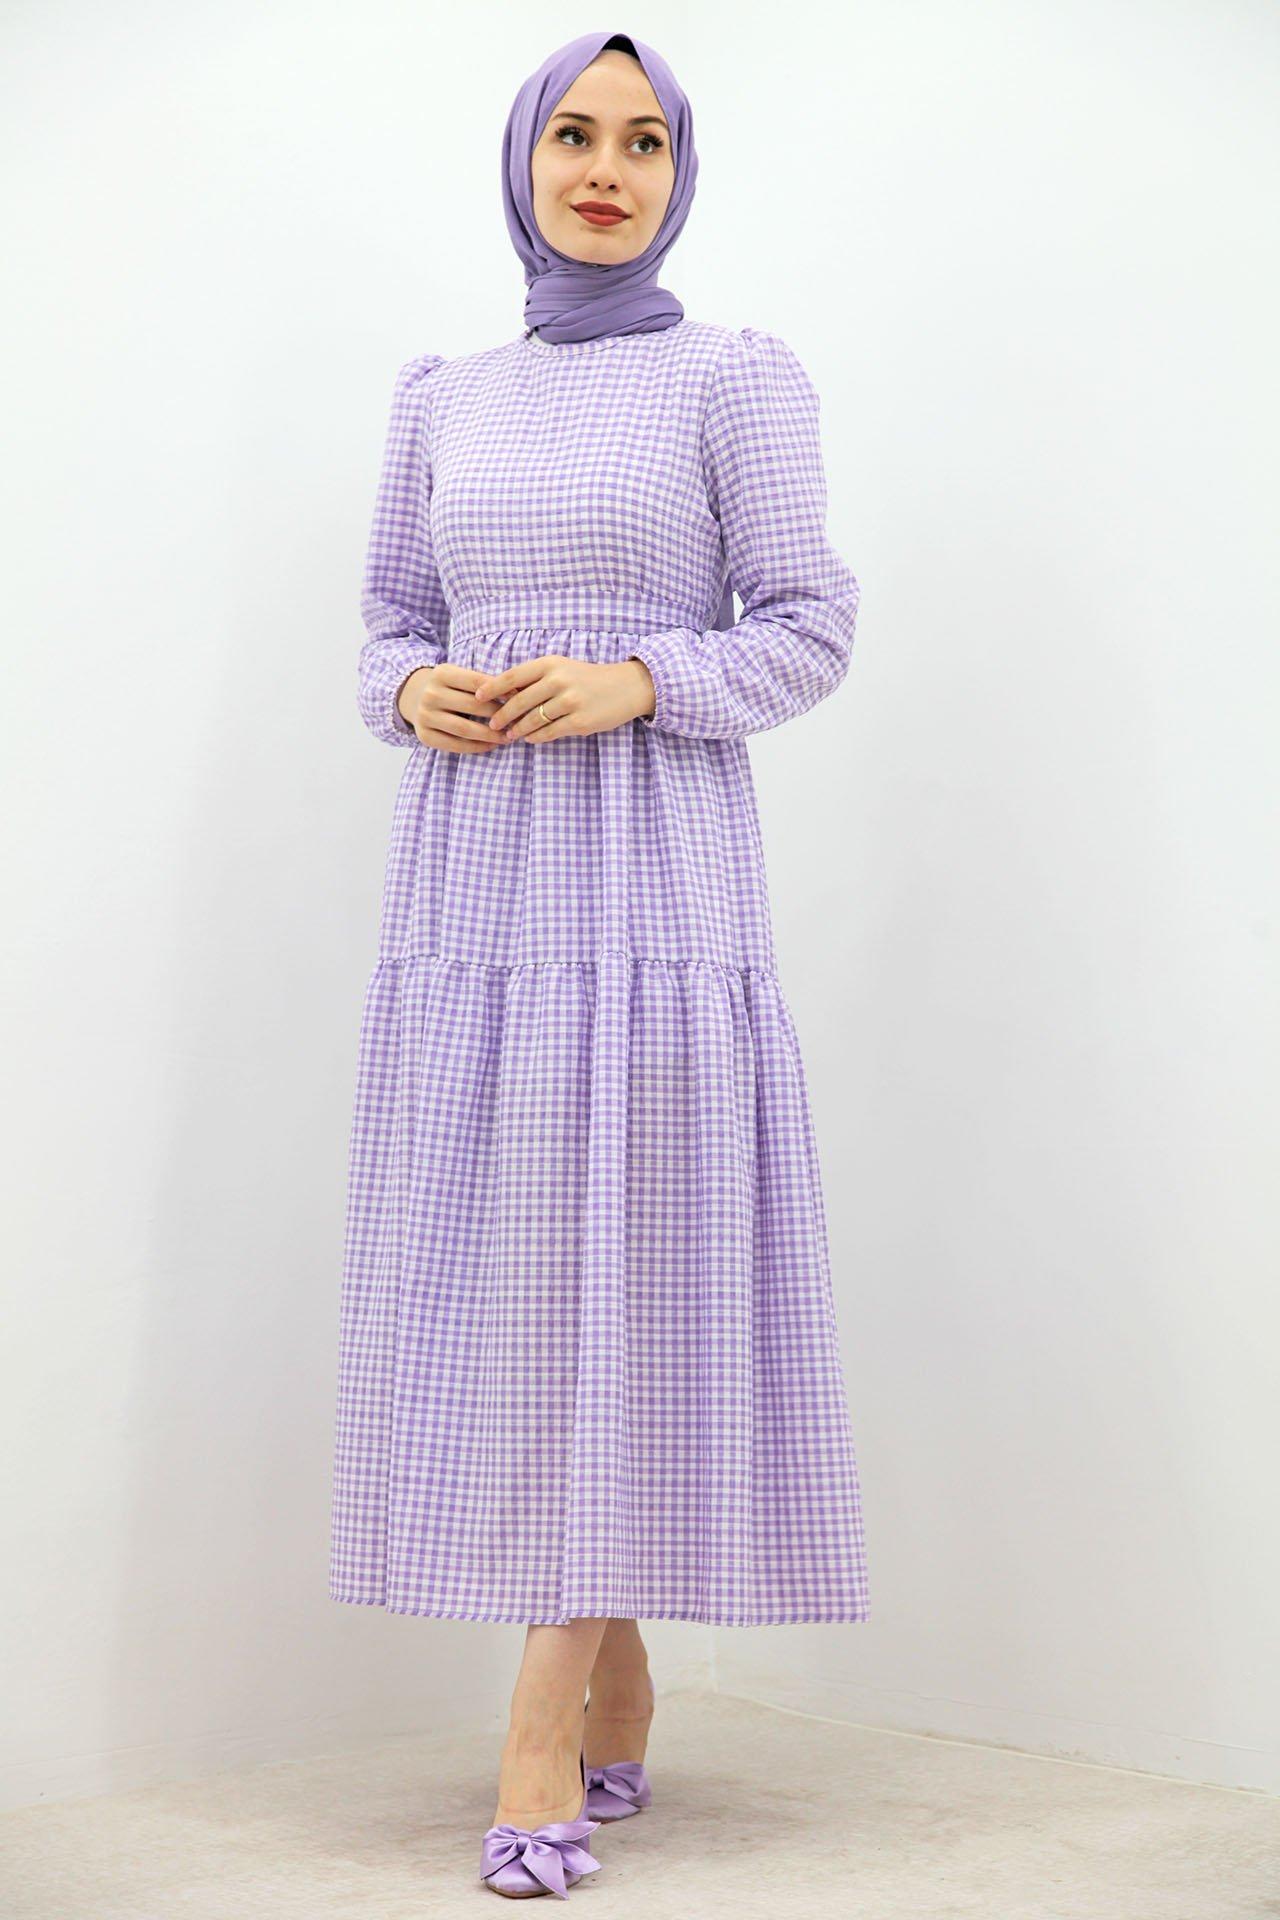 GİZAGİYİM - Küçük Pötikare Elbise Lila